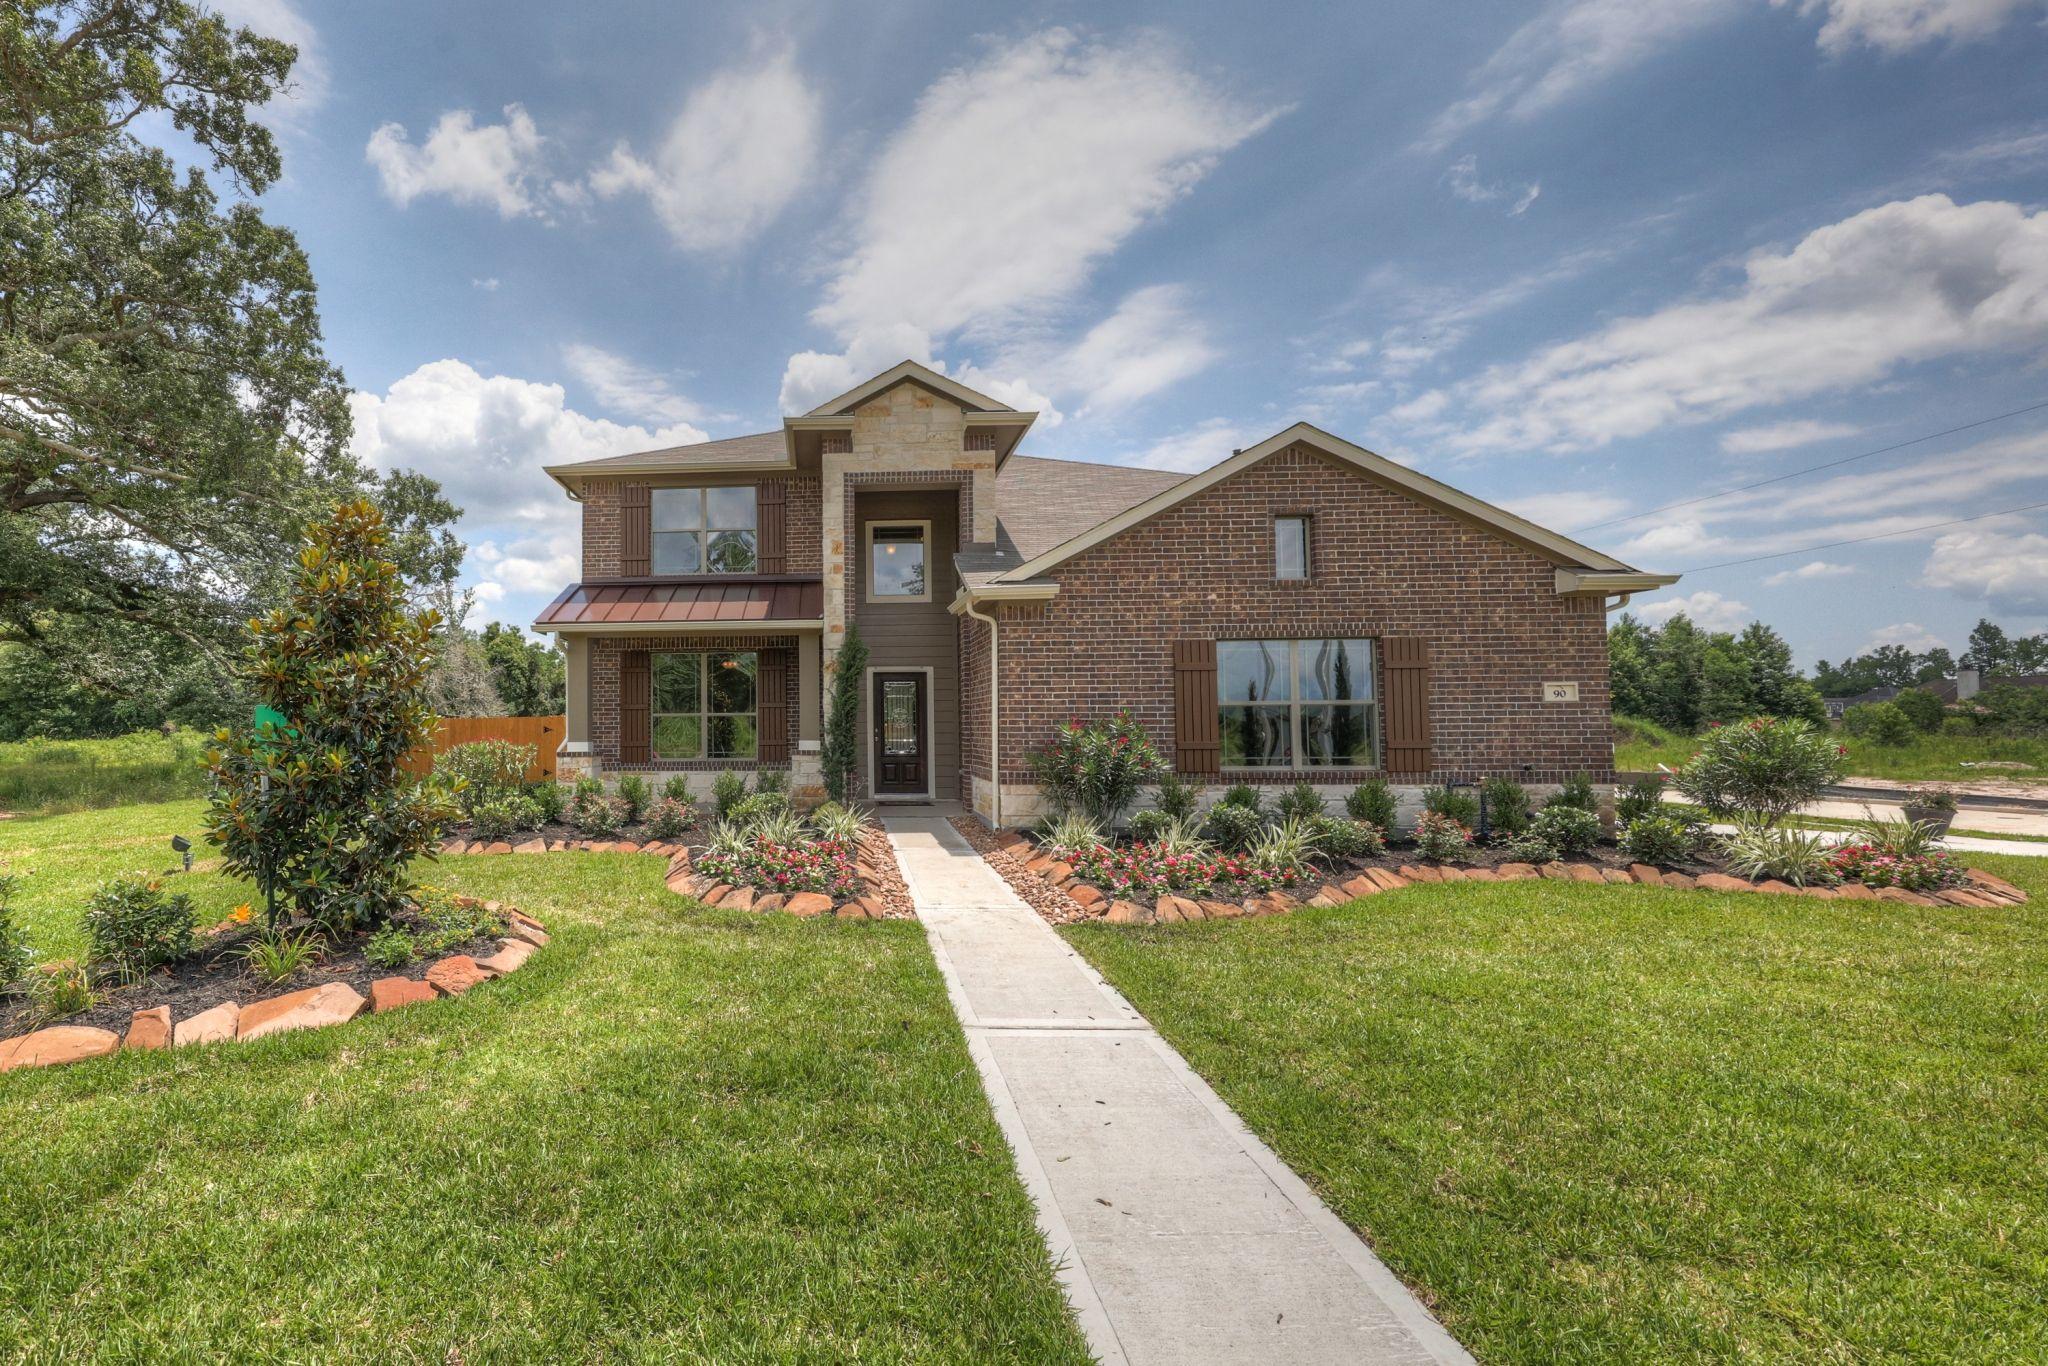 Builder Opens New Section Of Dayton Neighborhood Houston Real